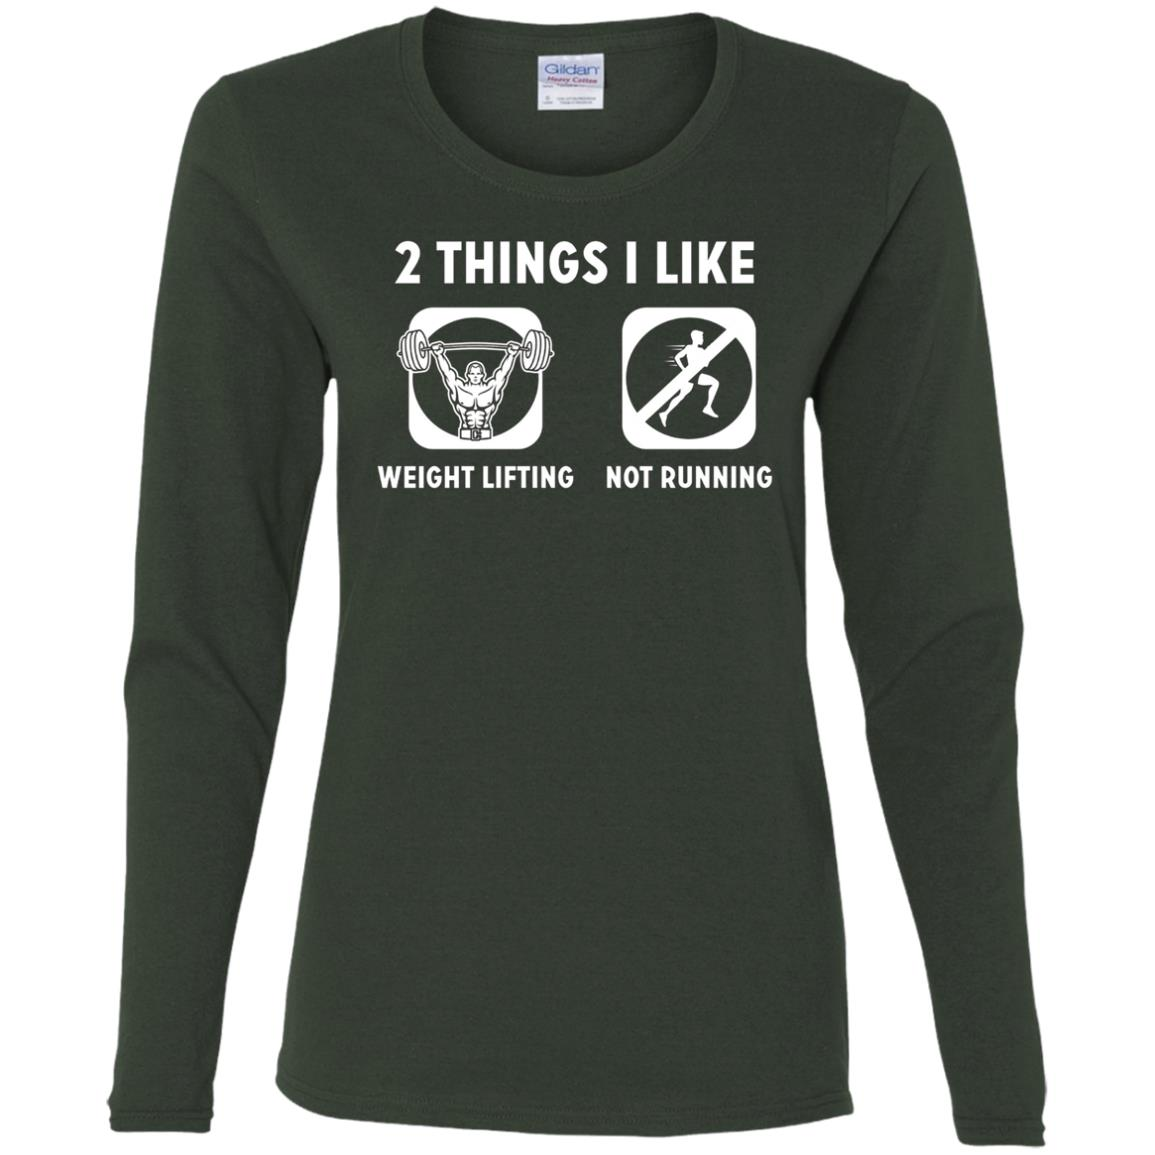 2 Things I Like Weight Lifting Not Running Women Long Sleeve T-Shirt